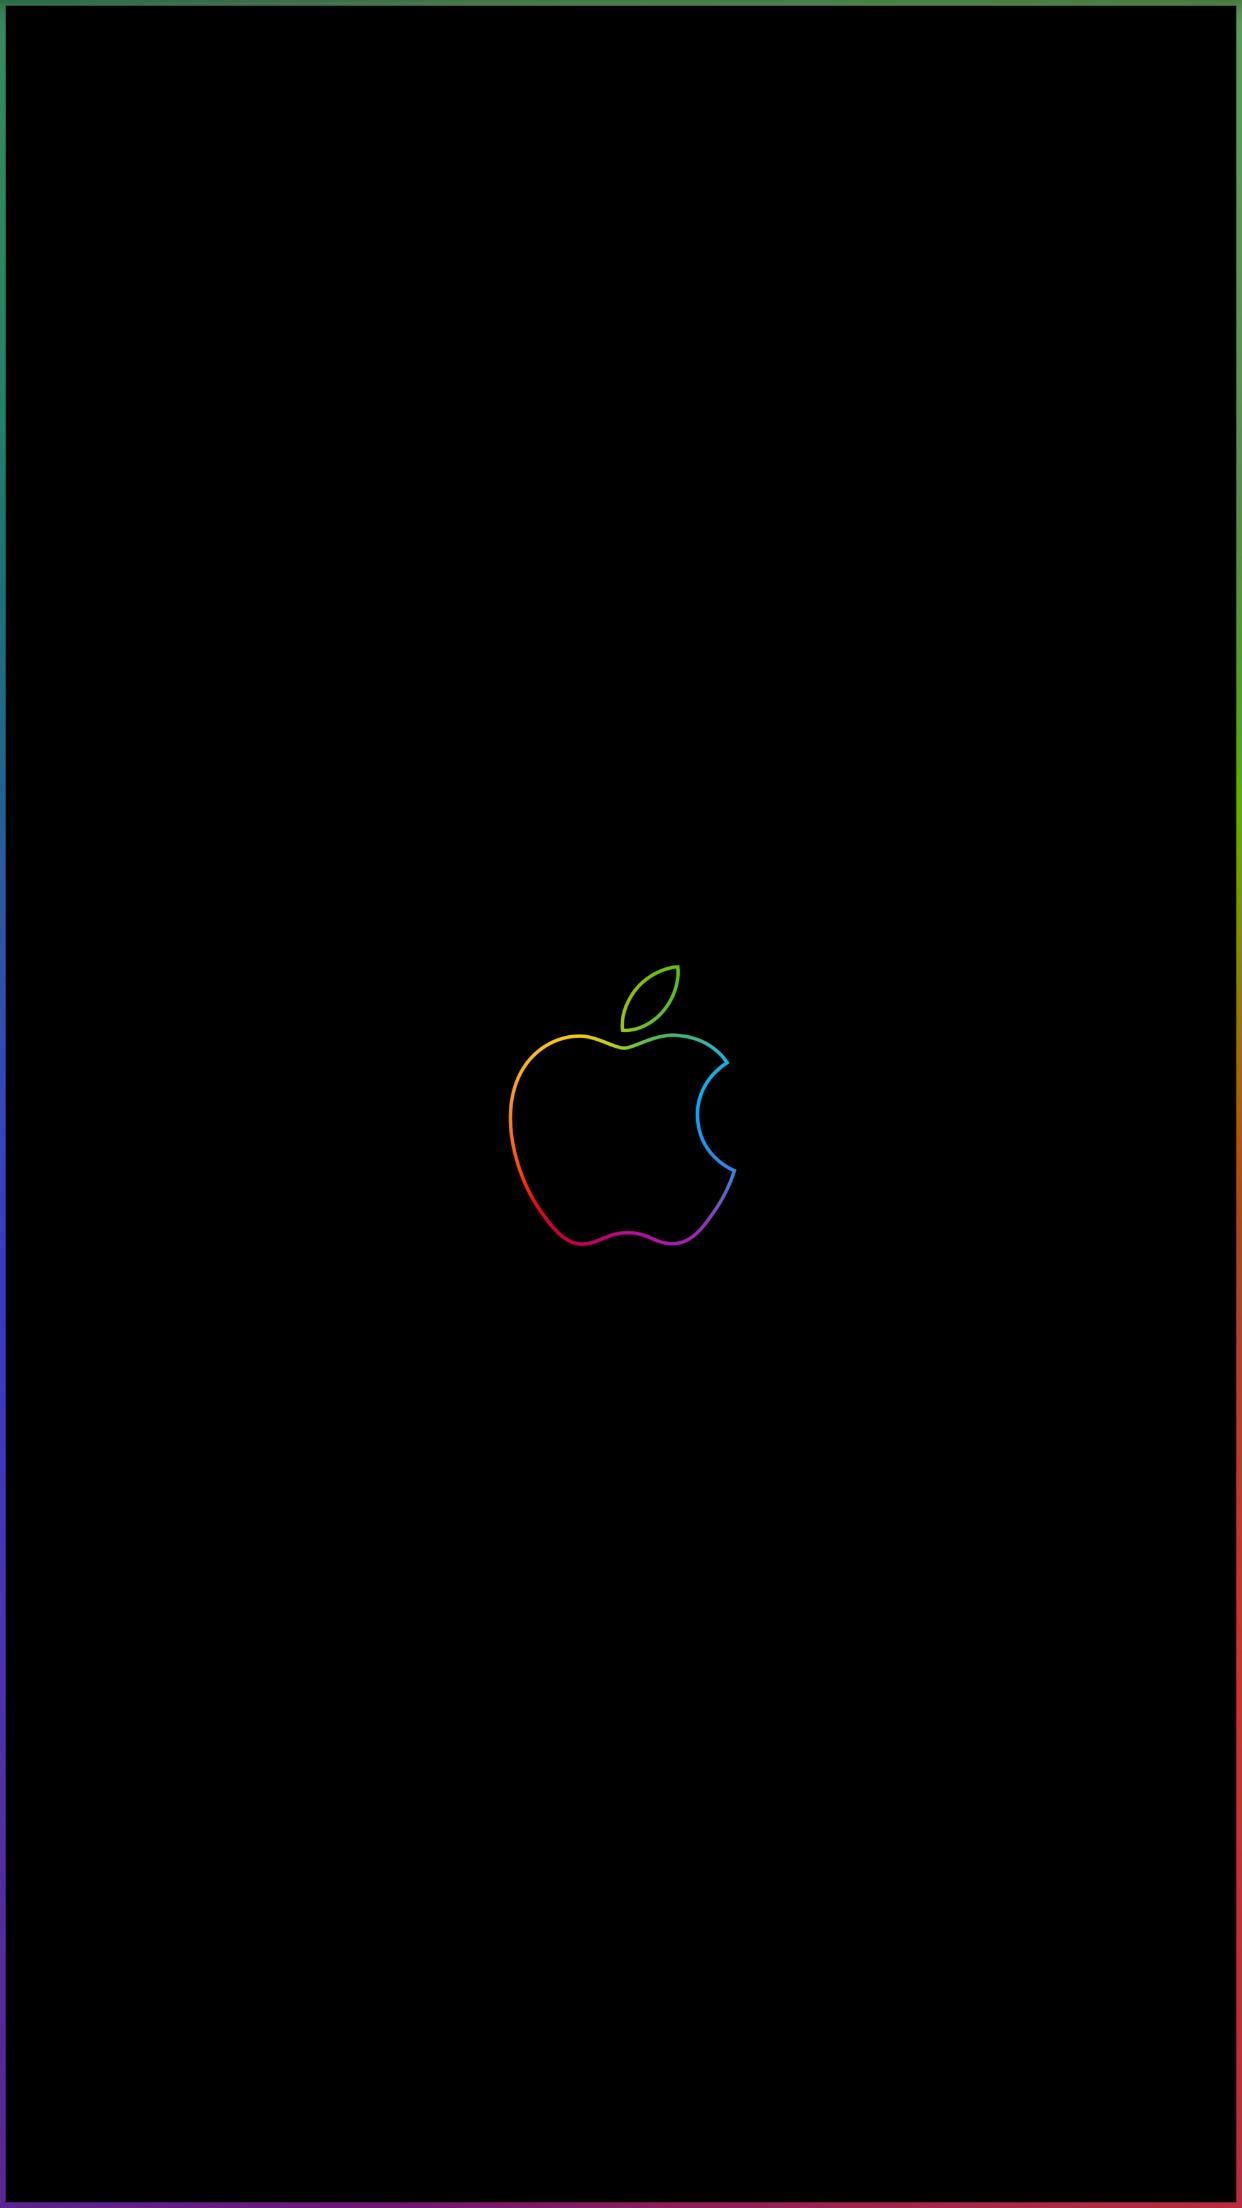 Rainbow Border Wallpaper : rainbow, border, wallpaper, Rainbow, Border, &, Apple, Logohttps://i.redd.it/2obugiy1c5w11.png, Logo,, Wallpaper, Iphone,